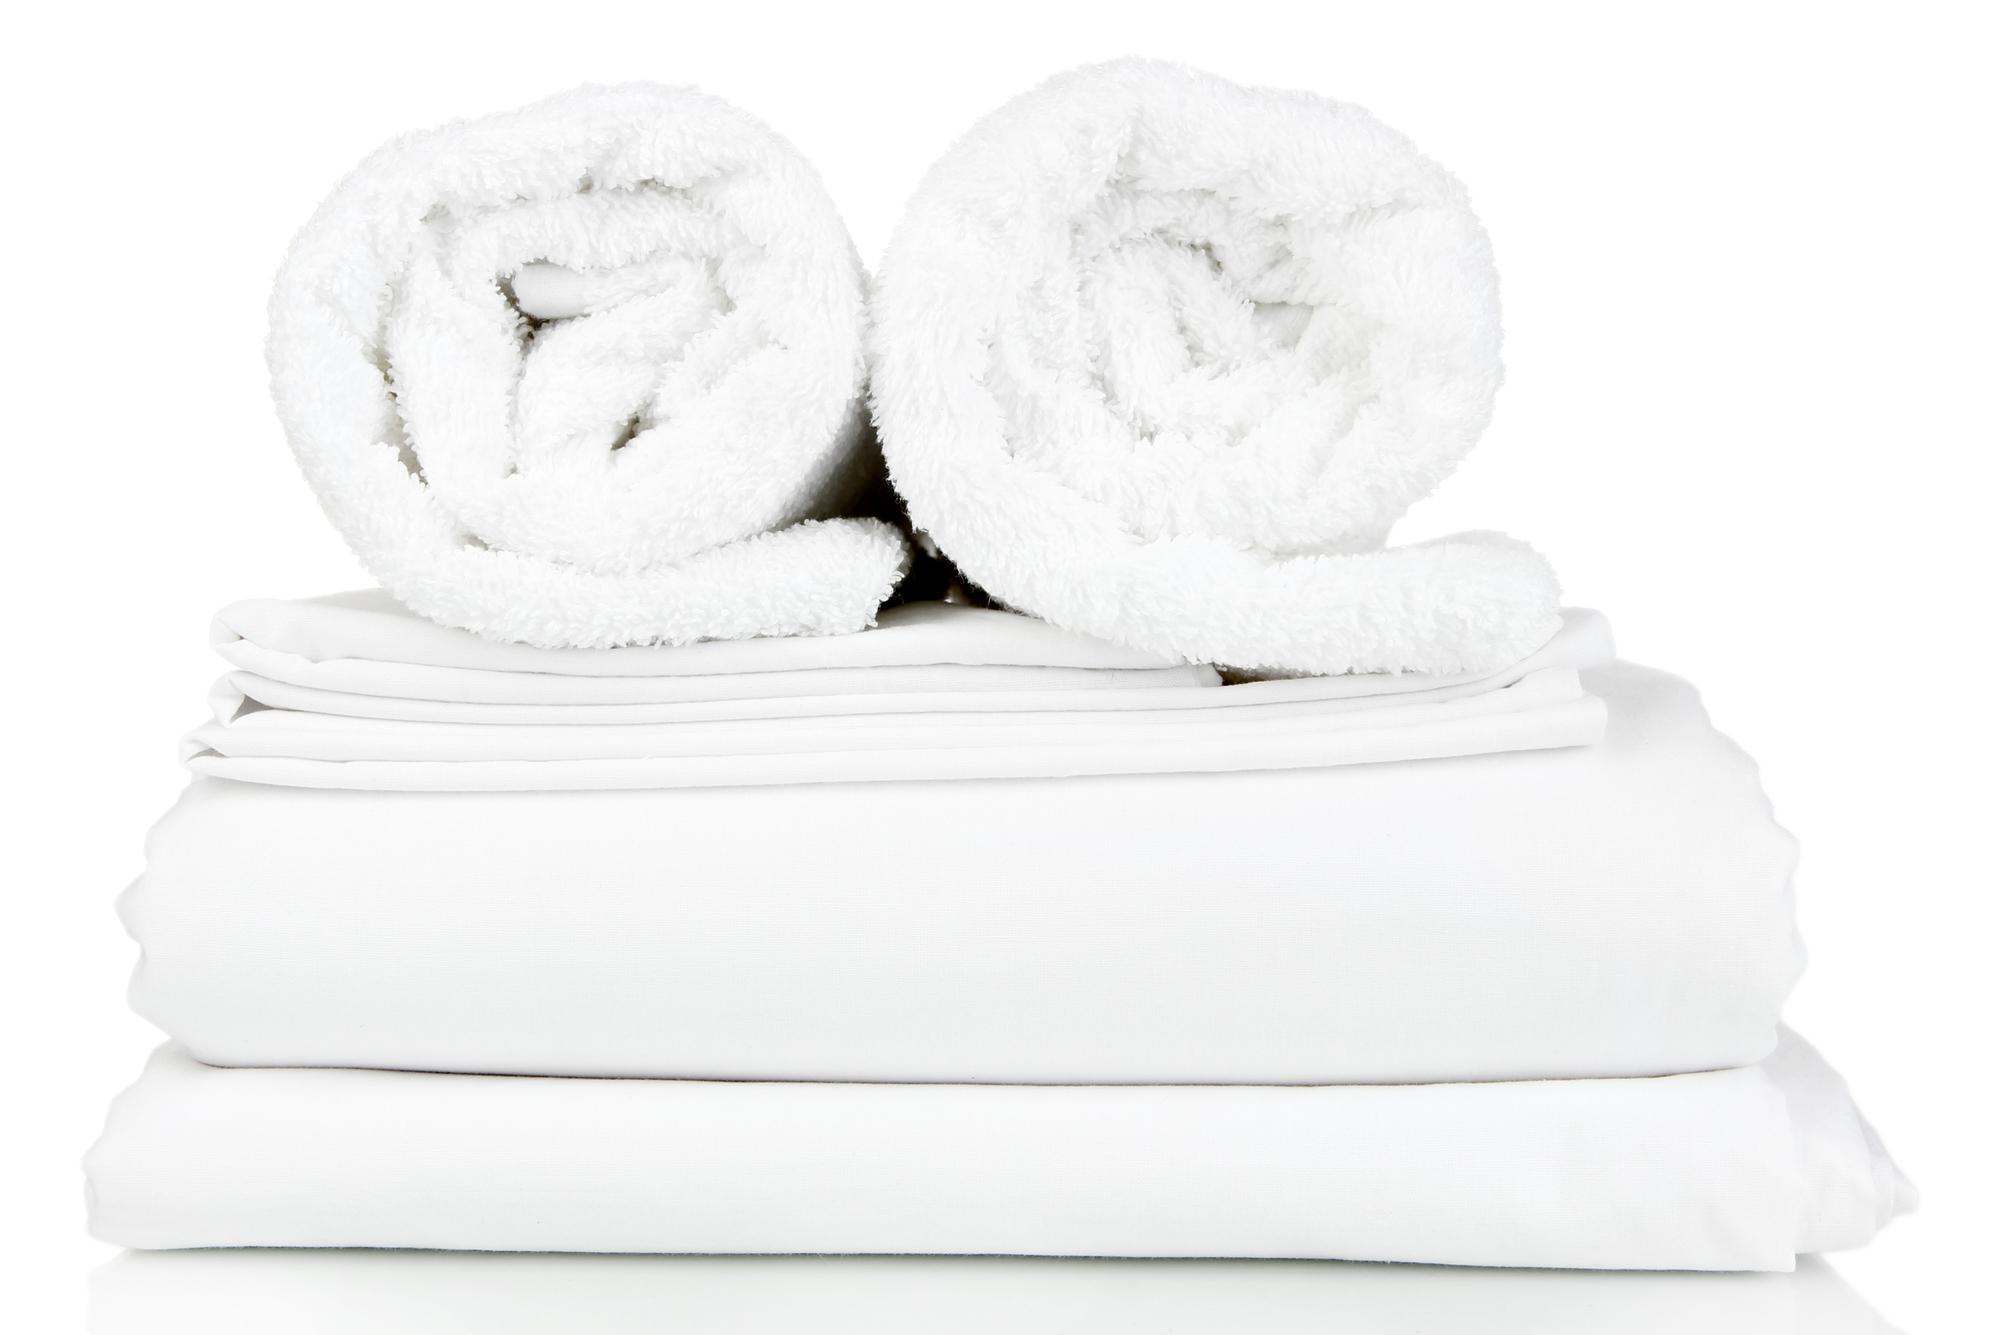 Bedding (sheet, blanket, medical pillow)